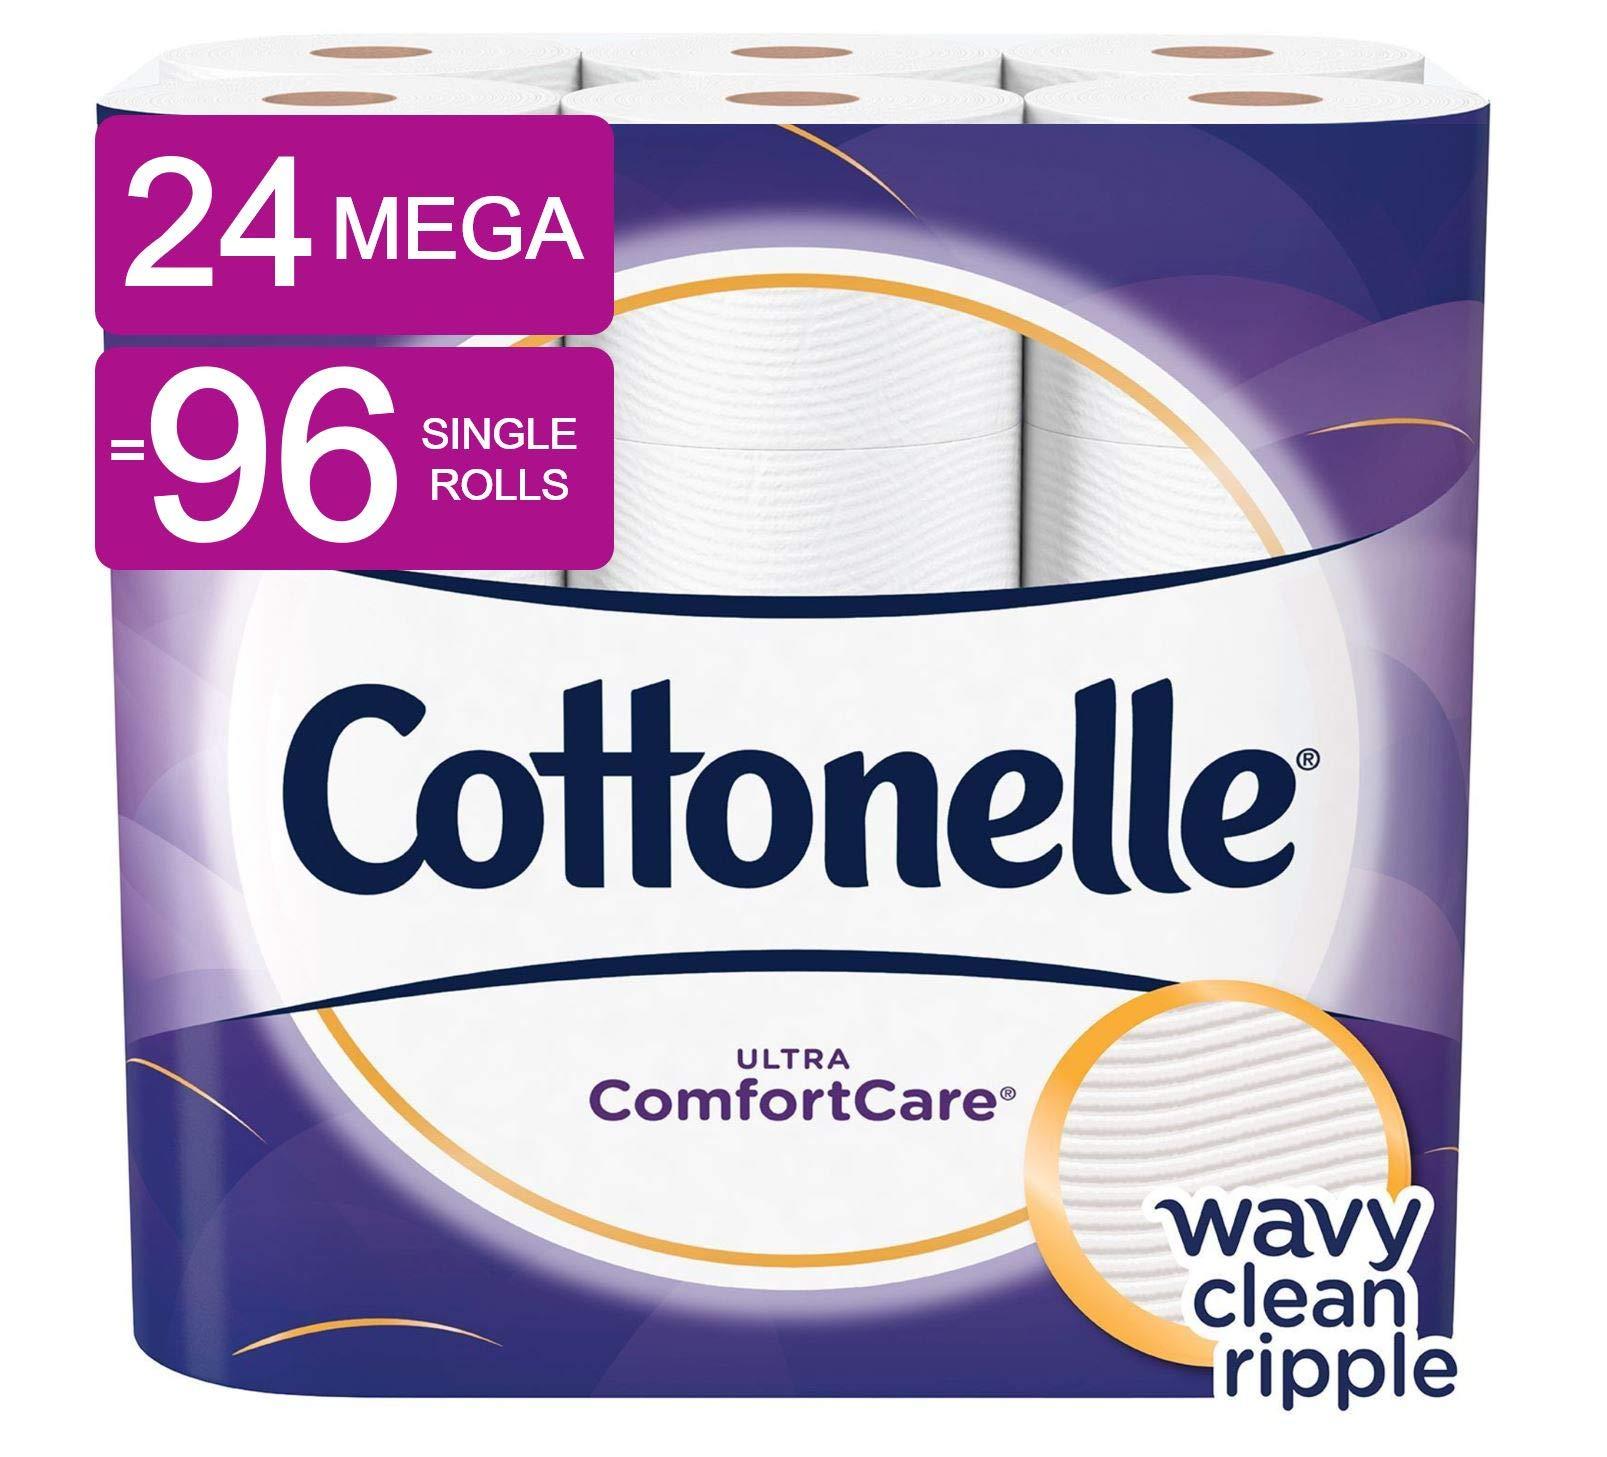 Cottonelle Ultra ComfortCare Soft Toilet Paper, 24 Mega Rolls, Bath Tissue